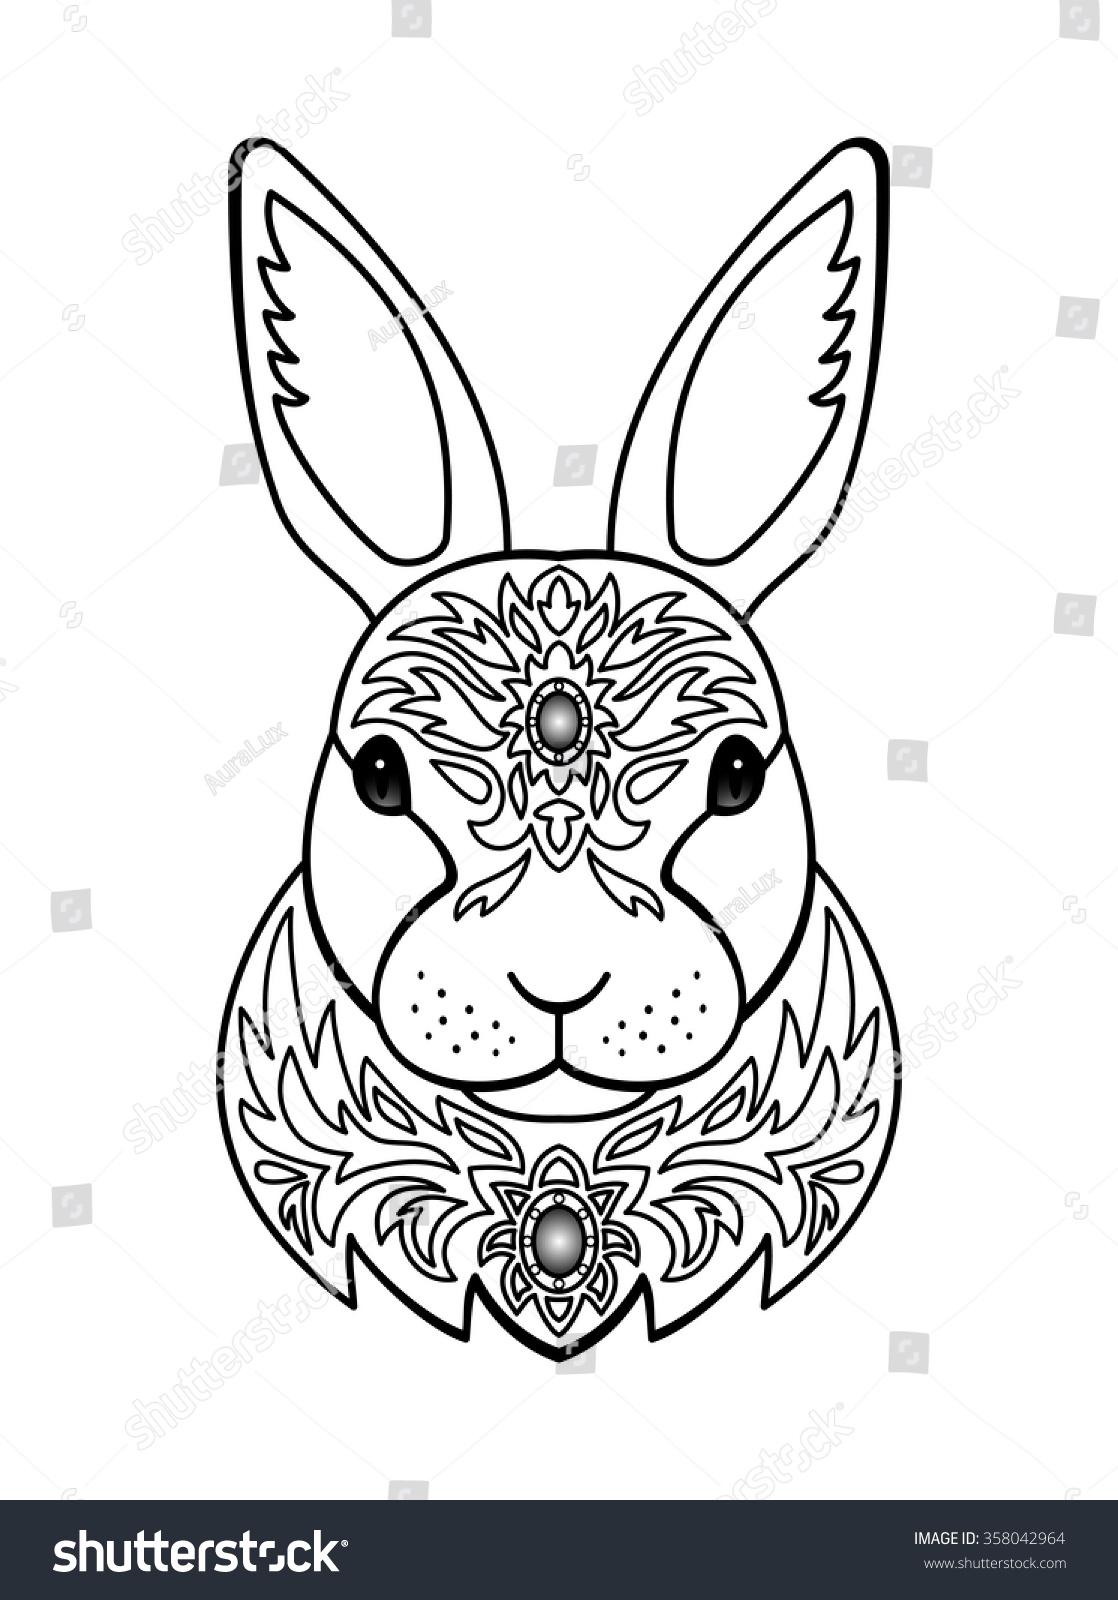 Ornamental White Rabbit Vector Illustration Of Abstract Animal For